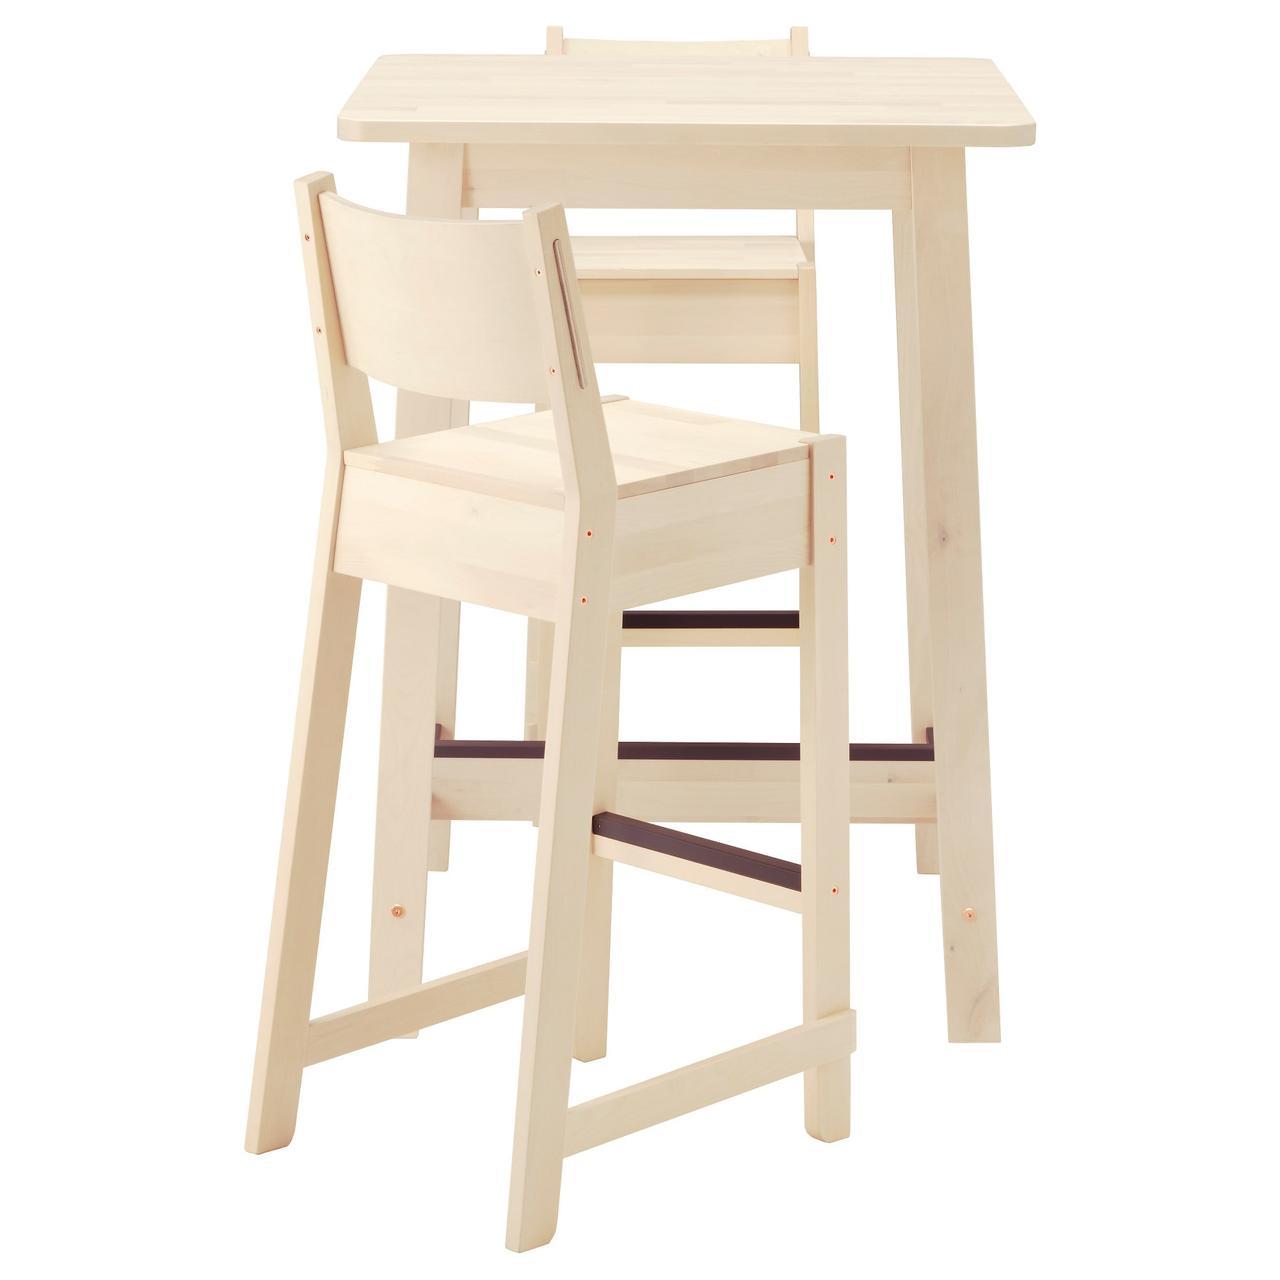 НОРРОКЕР / НОРРОКЕР Барный стол и 2 барных стула, белый береза, белый береза